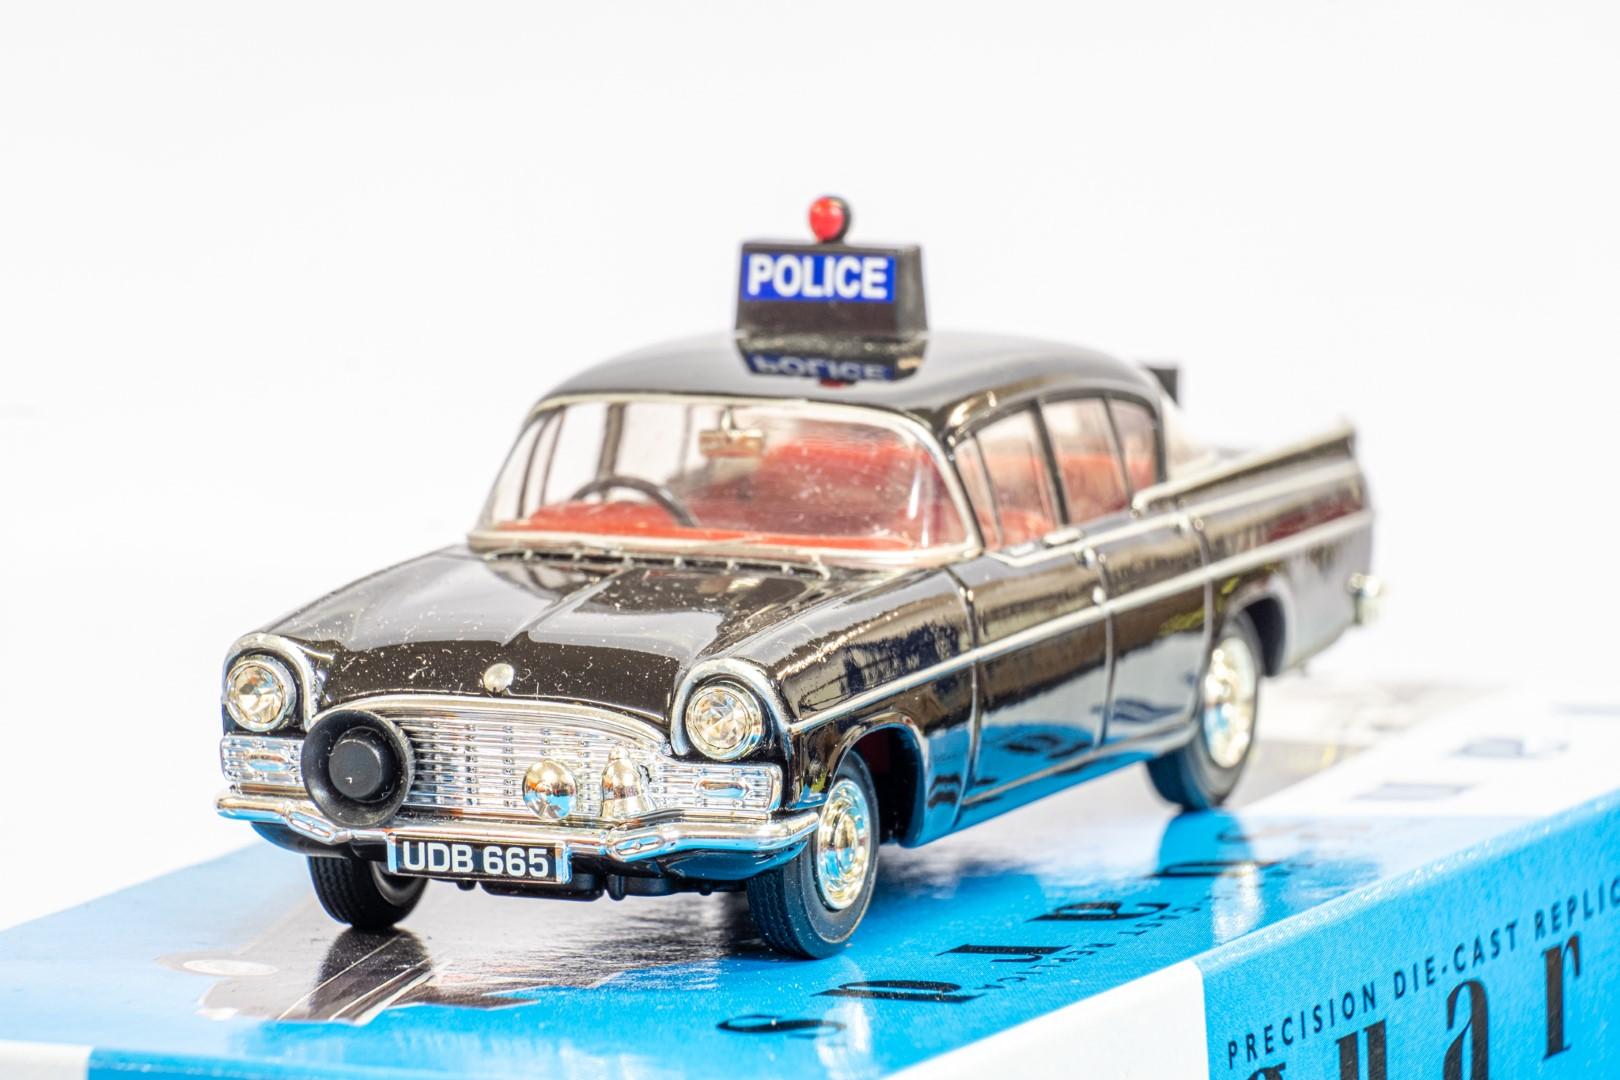 Vanguards Vauxhall Velox PA - Stockport Borough Police - Image 5 of 8